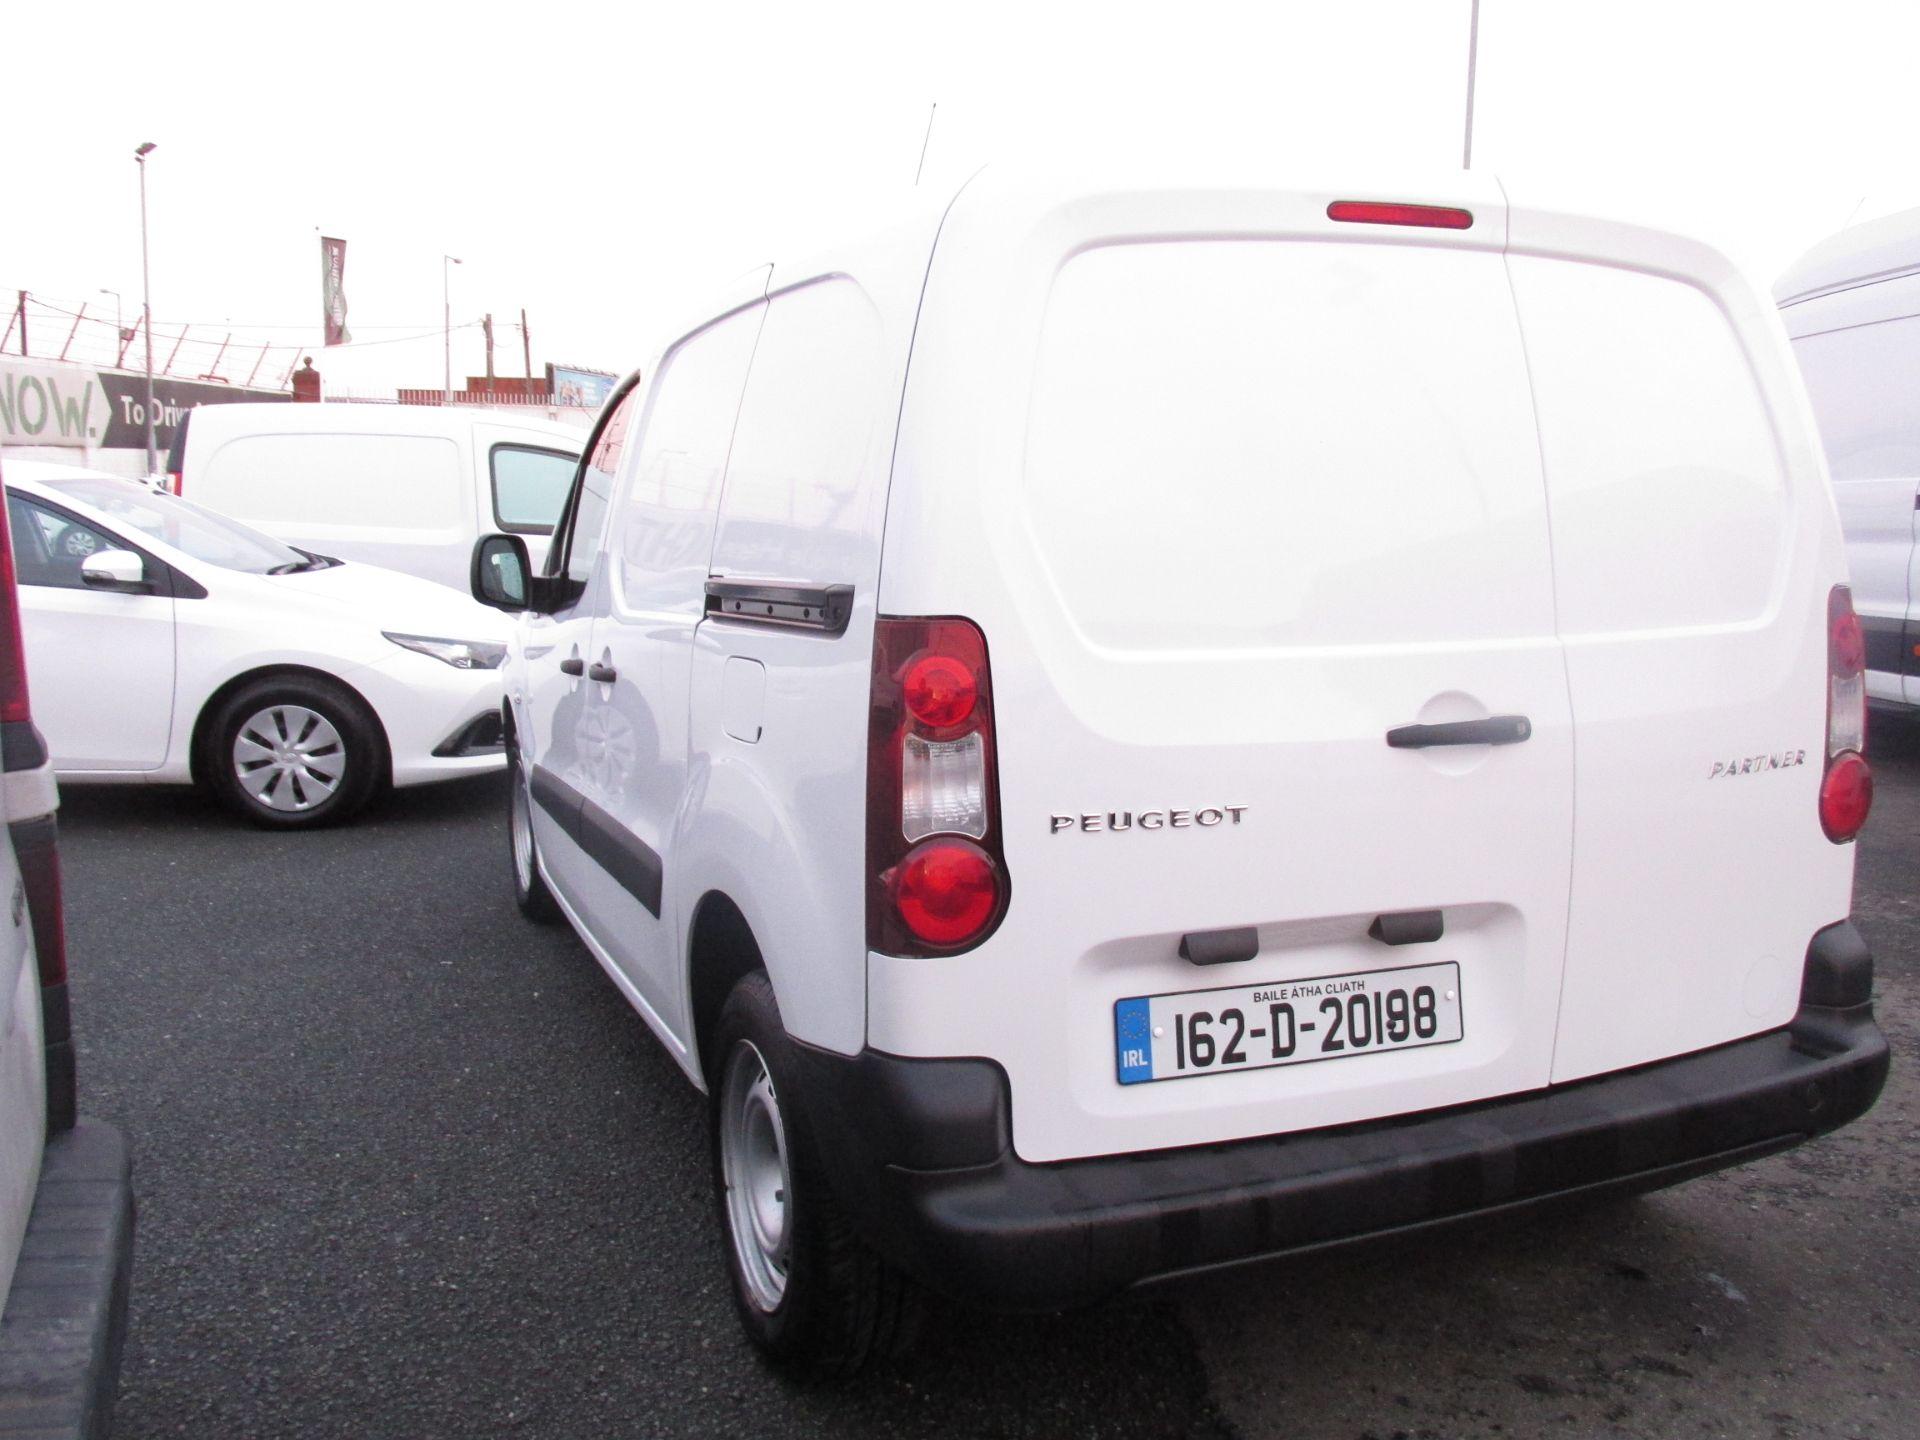 2016 Peugeot Partner Access 1.6 HDI 92 3DR (162D20198) Image 5